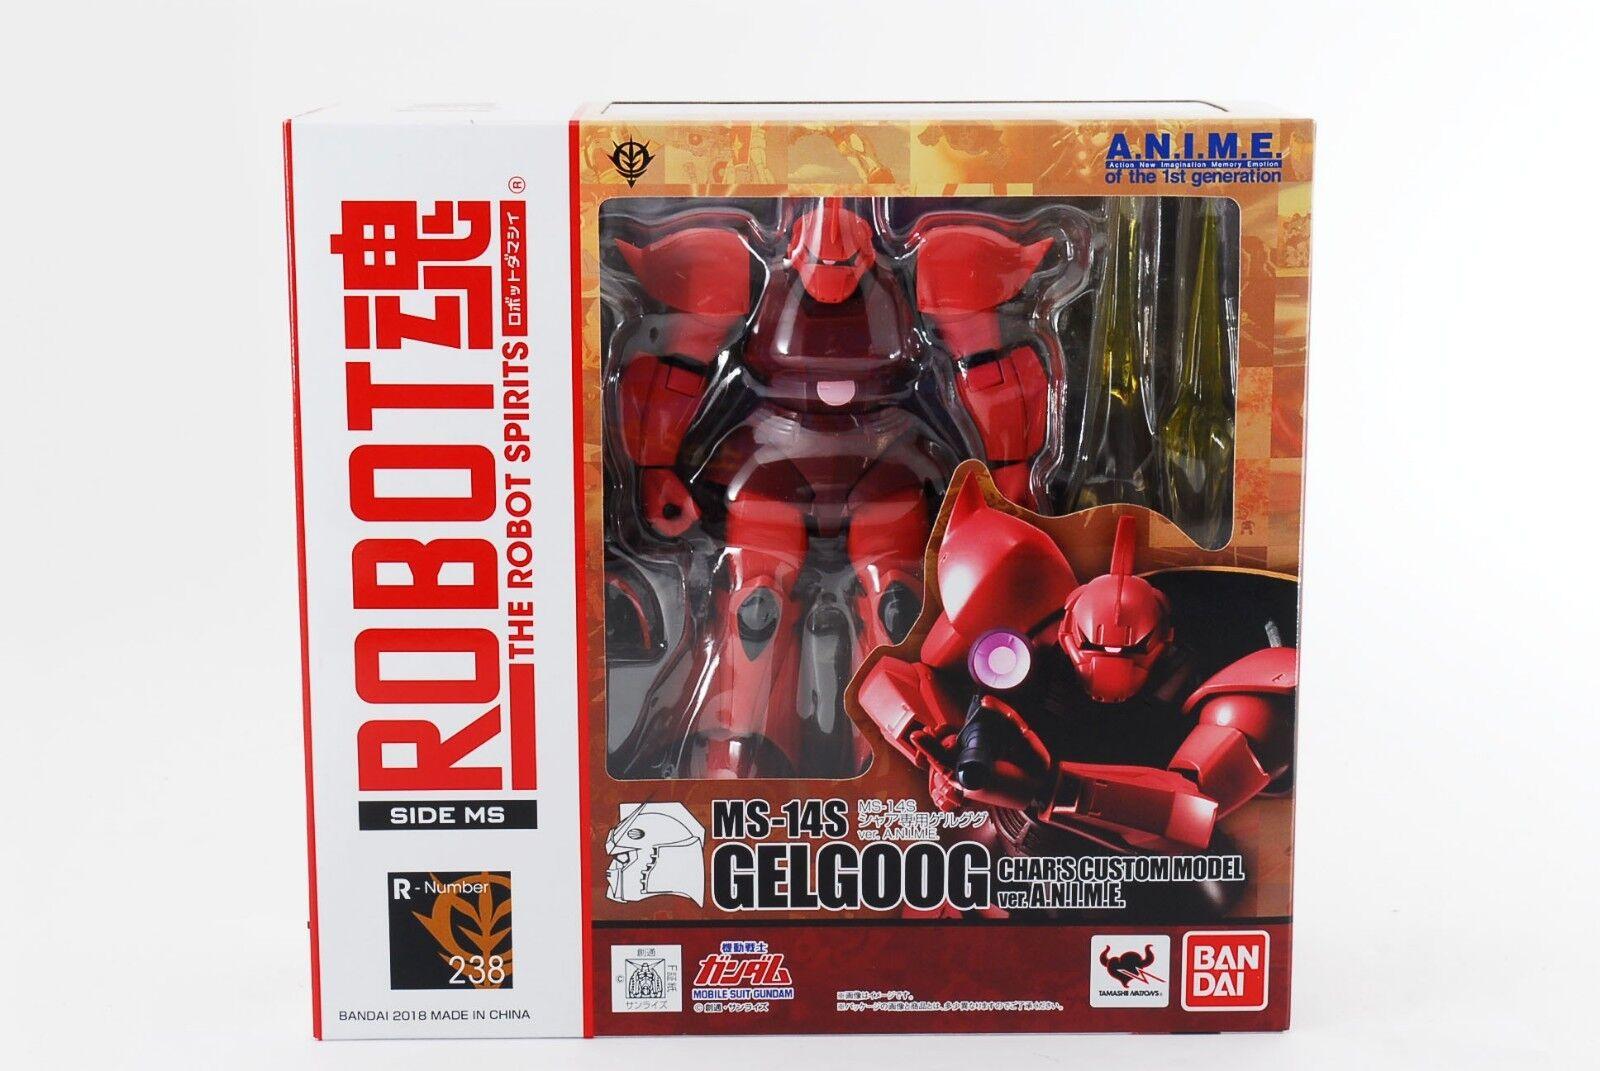 Robot Spirits Lato Ms MS14S Gelgoog CHAR'S su Misura Ver. A. N. I. M.E.cifra